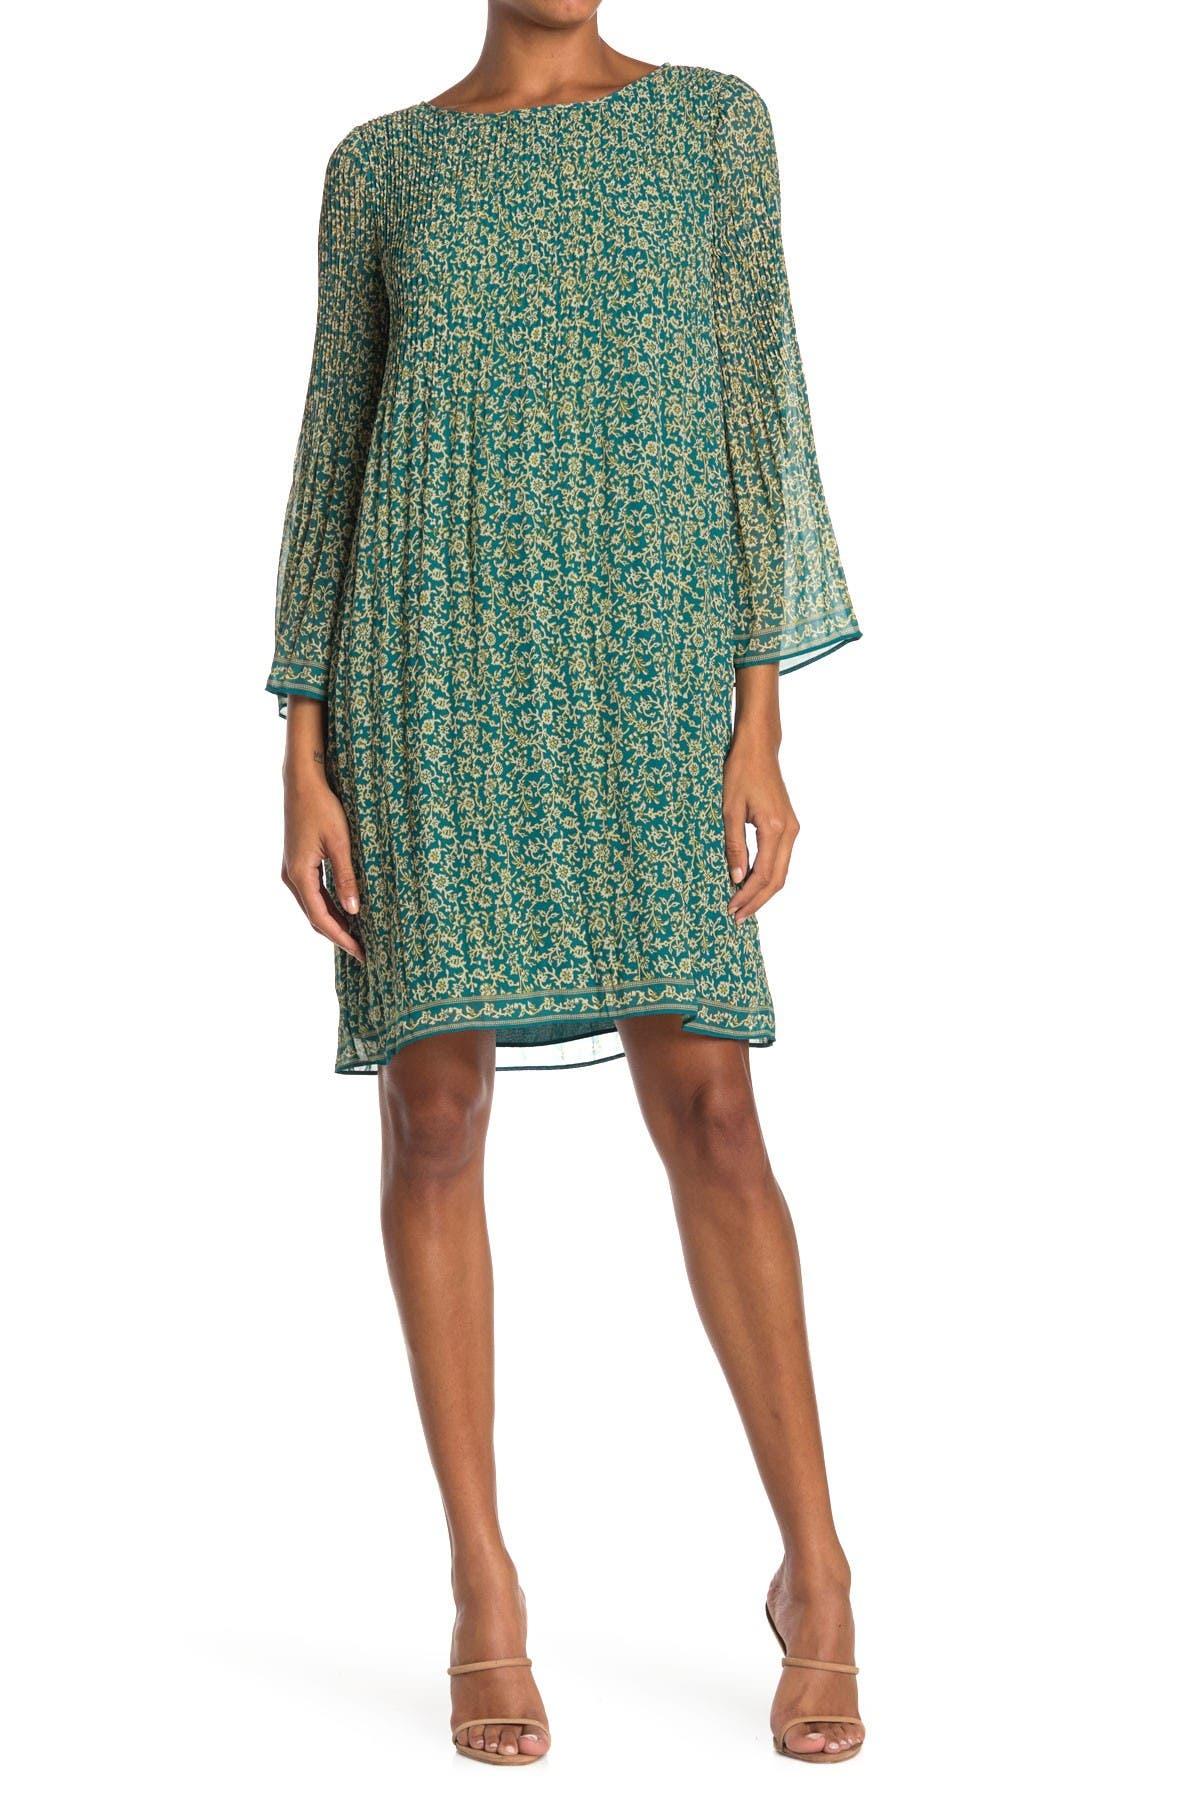 Image of Max Studio Printed Pleated Dress